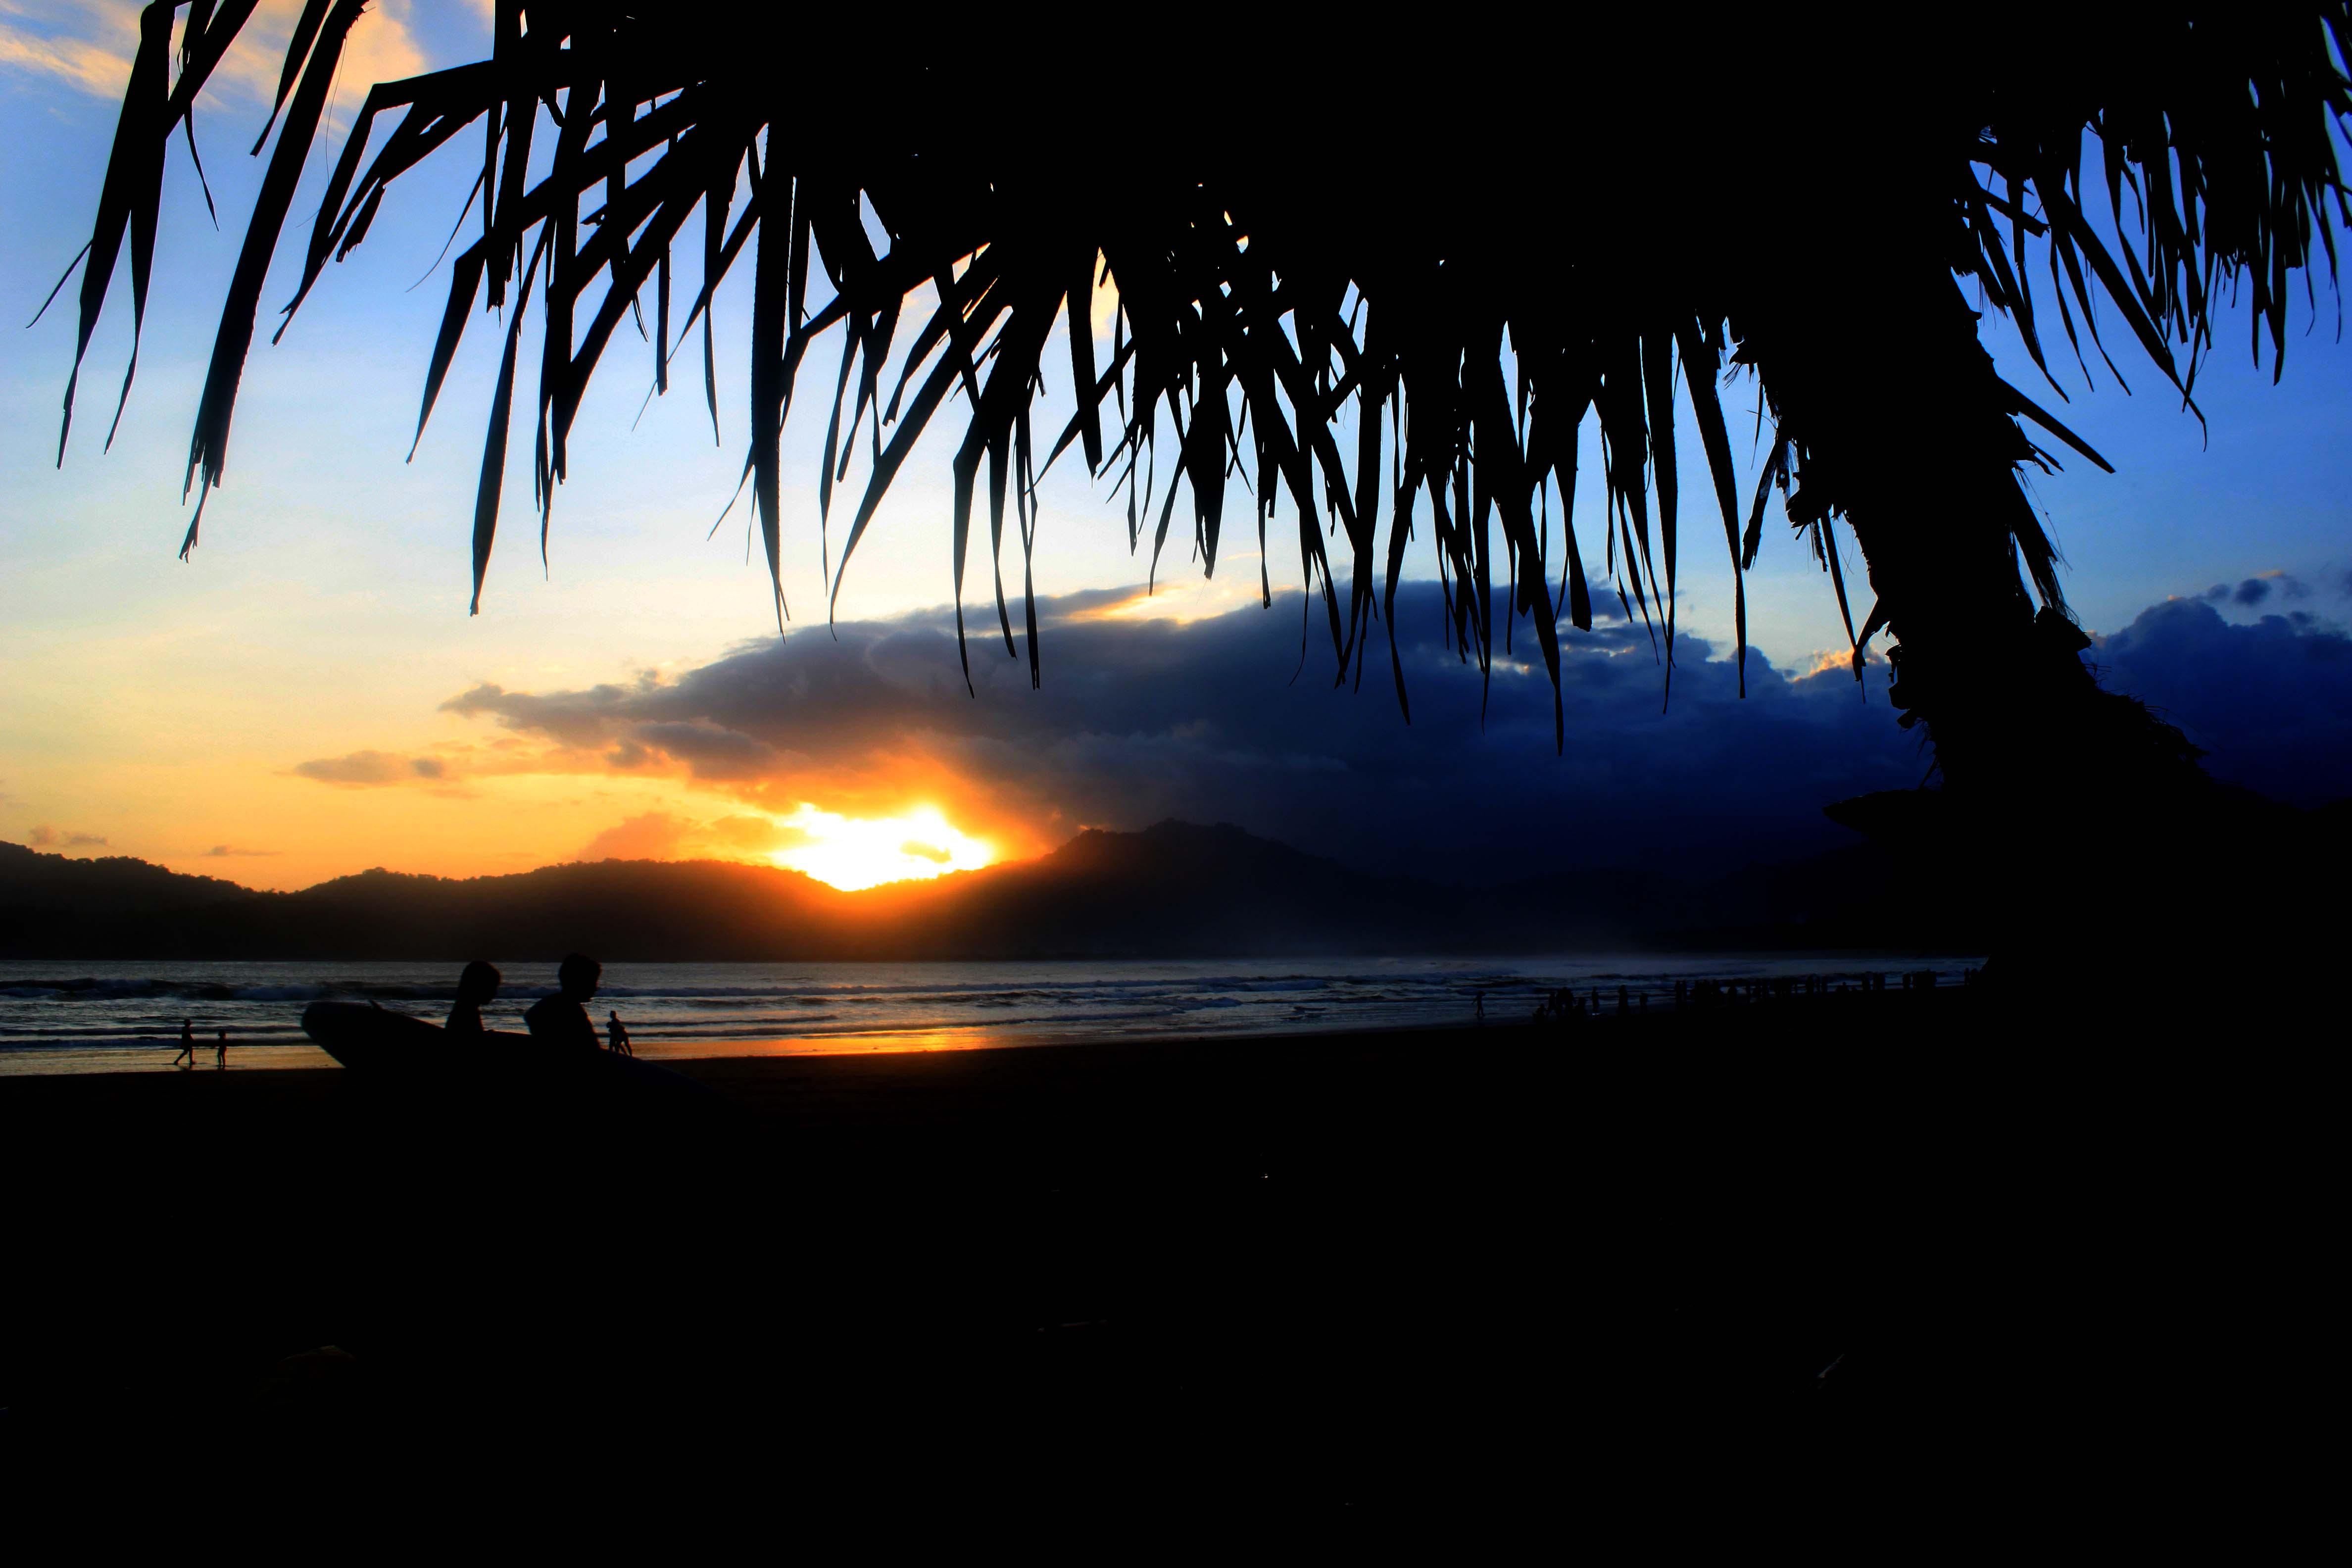 EKSOTIK PULAU MERAH/RED ISLAND, BANYUWANGI, INDONESIA. INTERNATIONAL ...